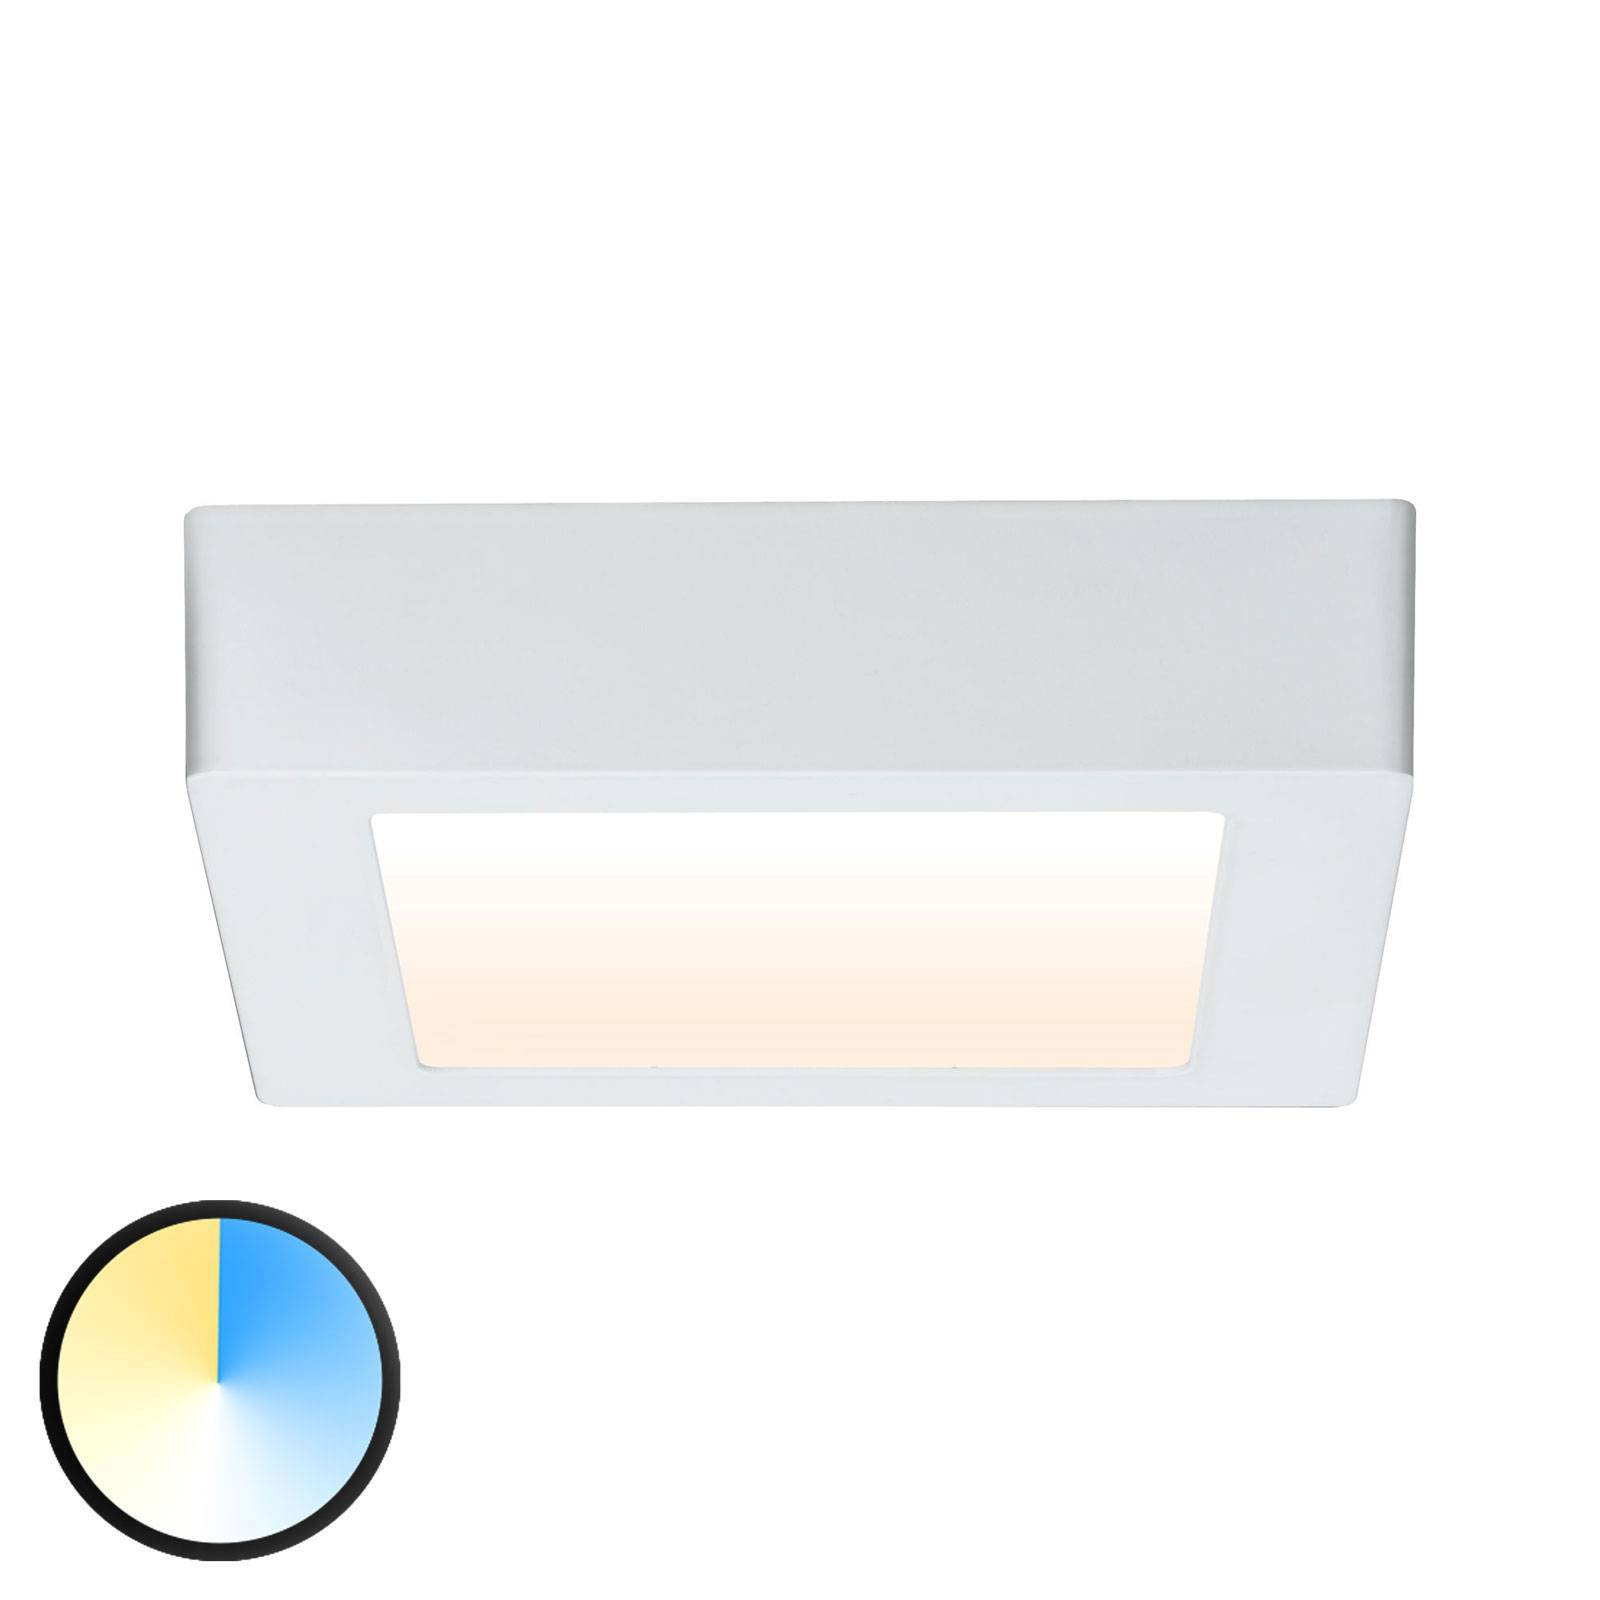 Paulmann Carpo LED-taklampe hvit 17x17 cm